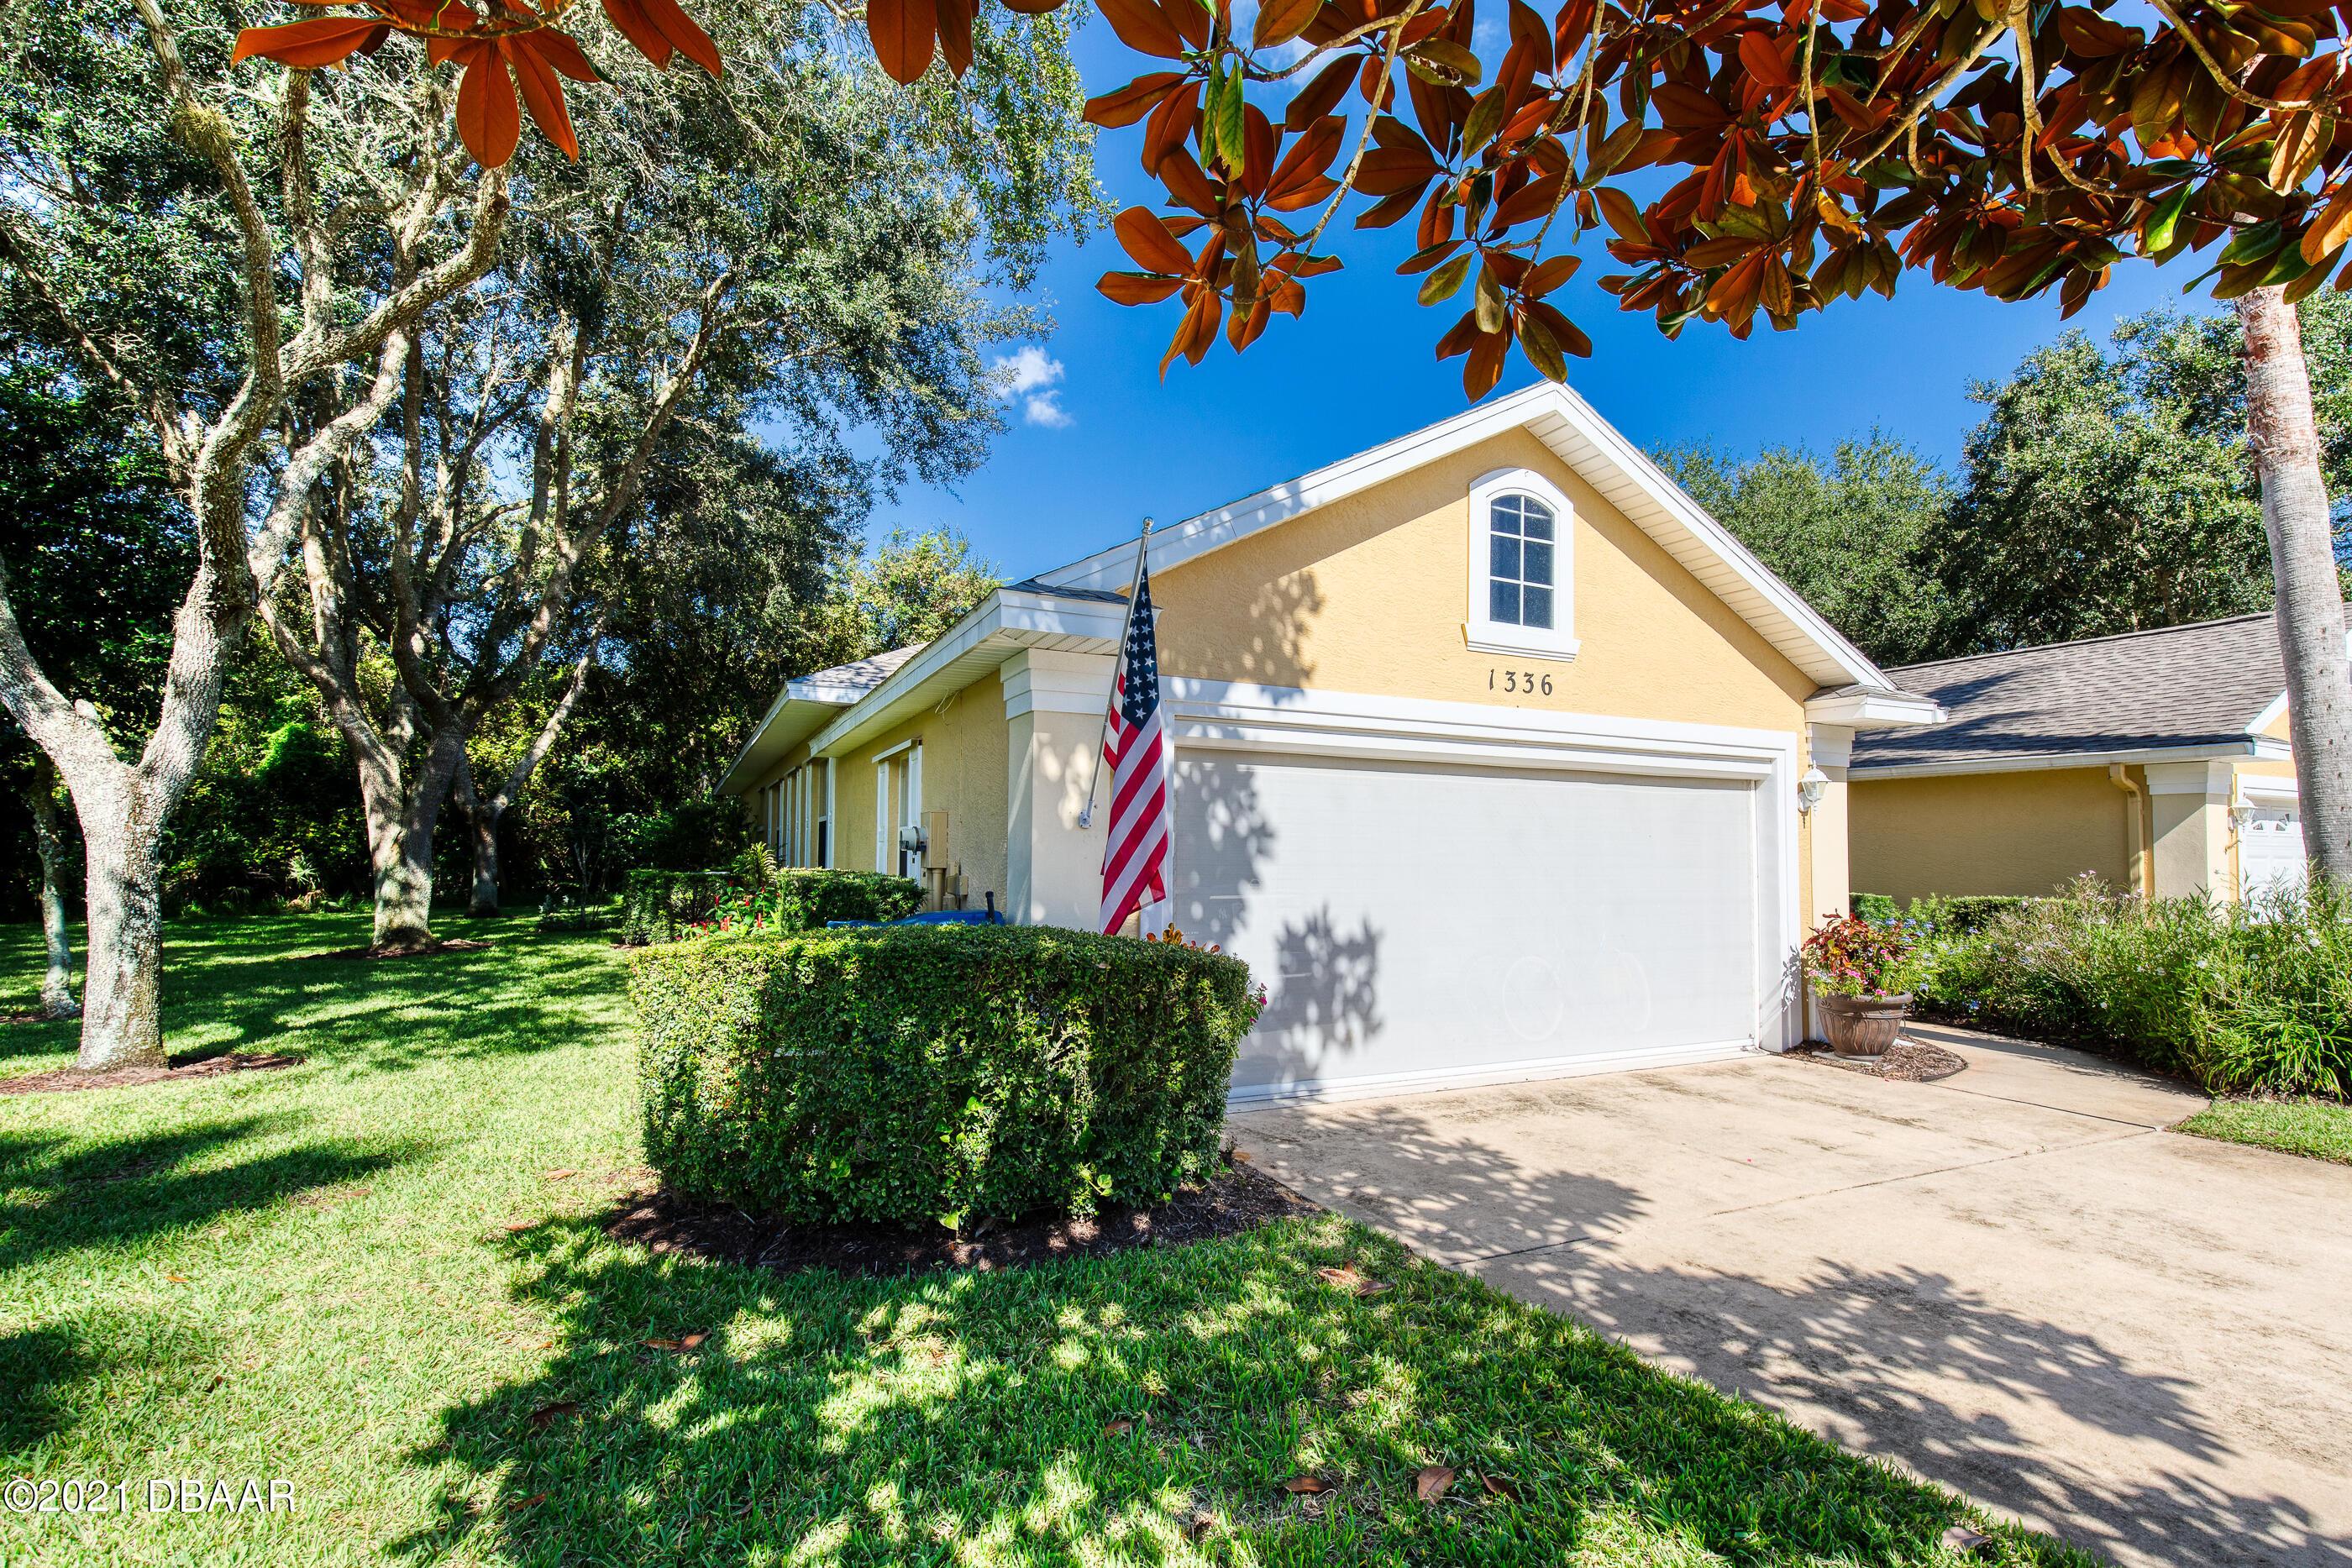 Photo of 1336 Asher Court, Ormond Beach, FL 32174